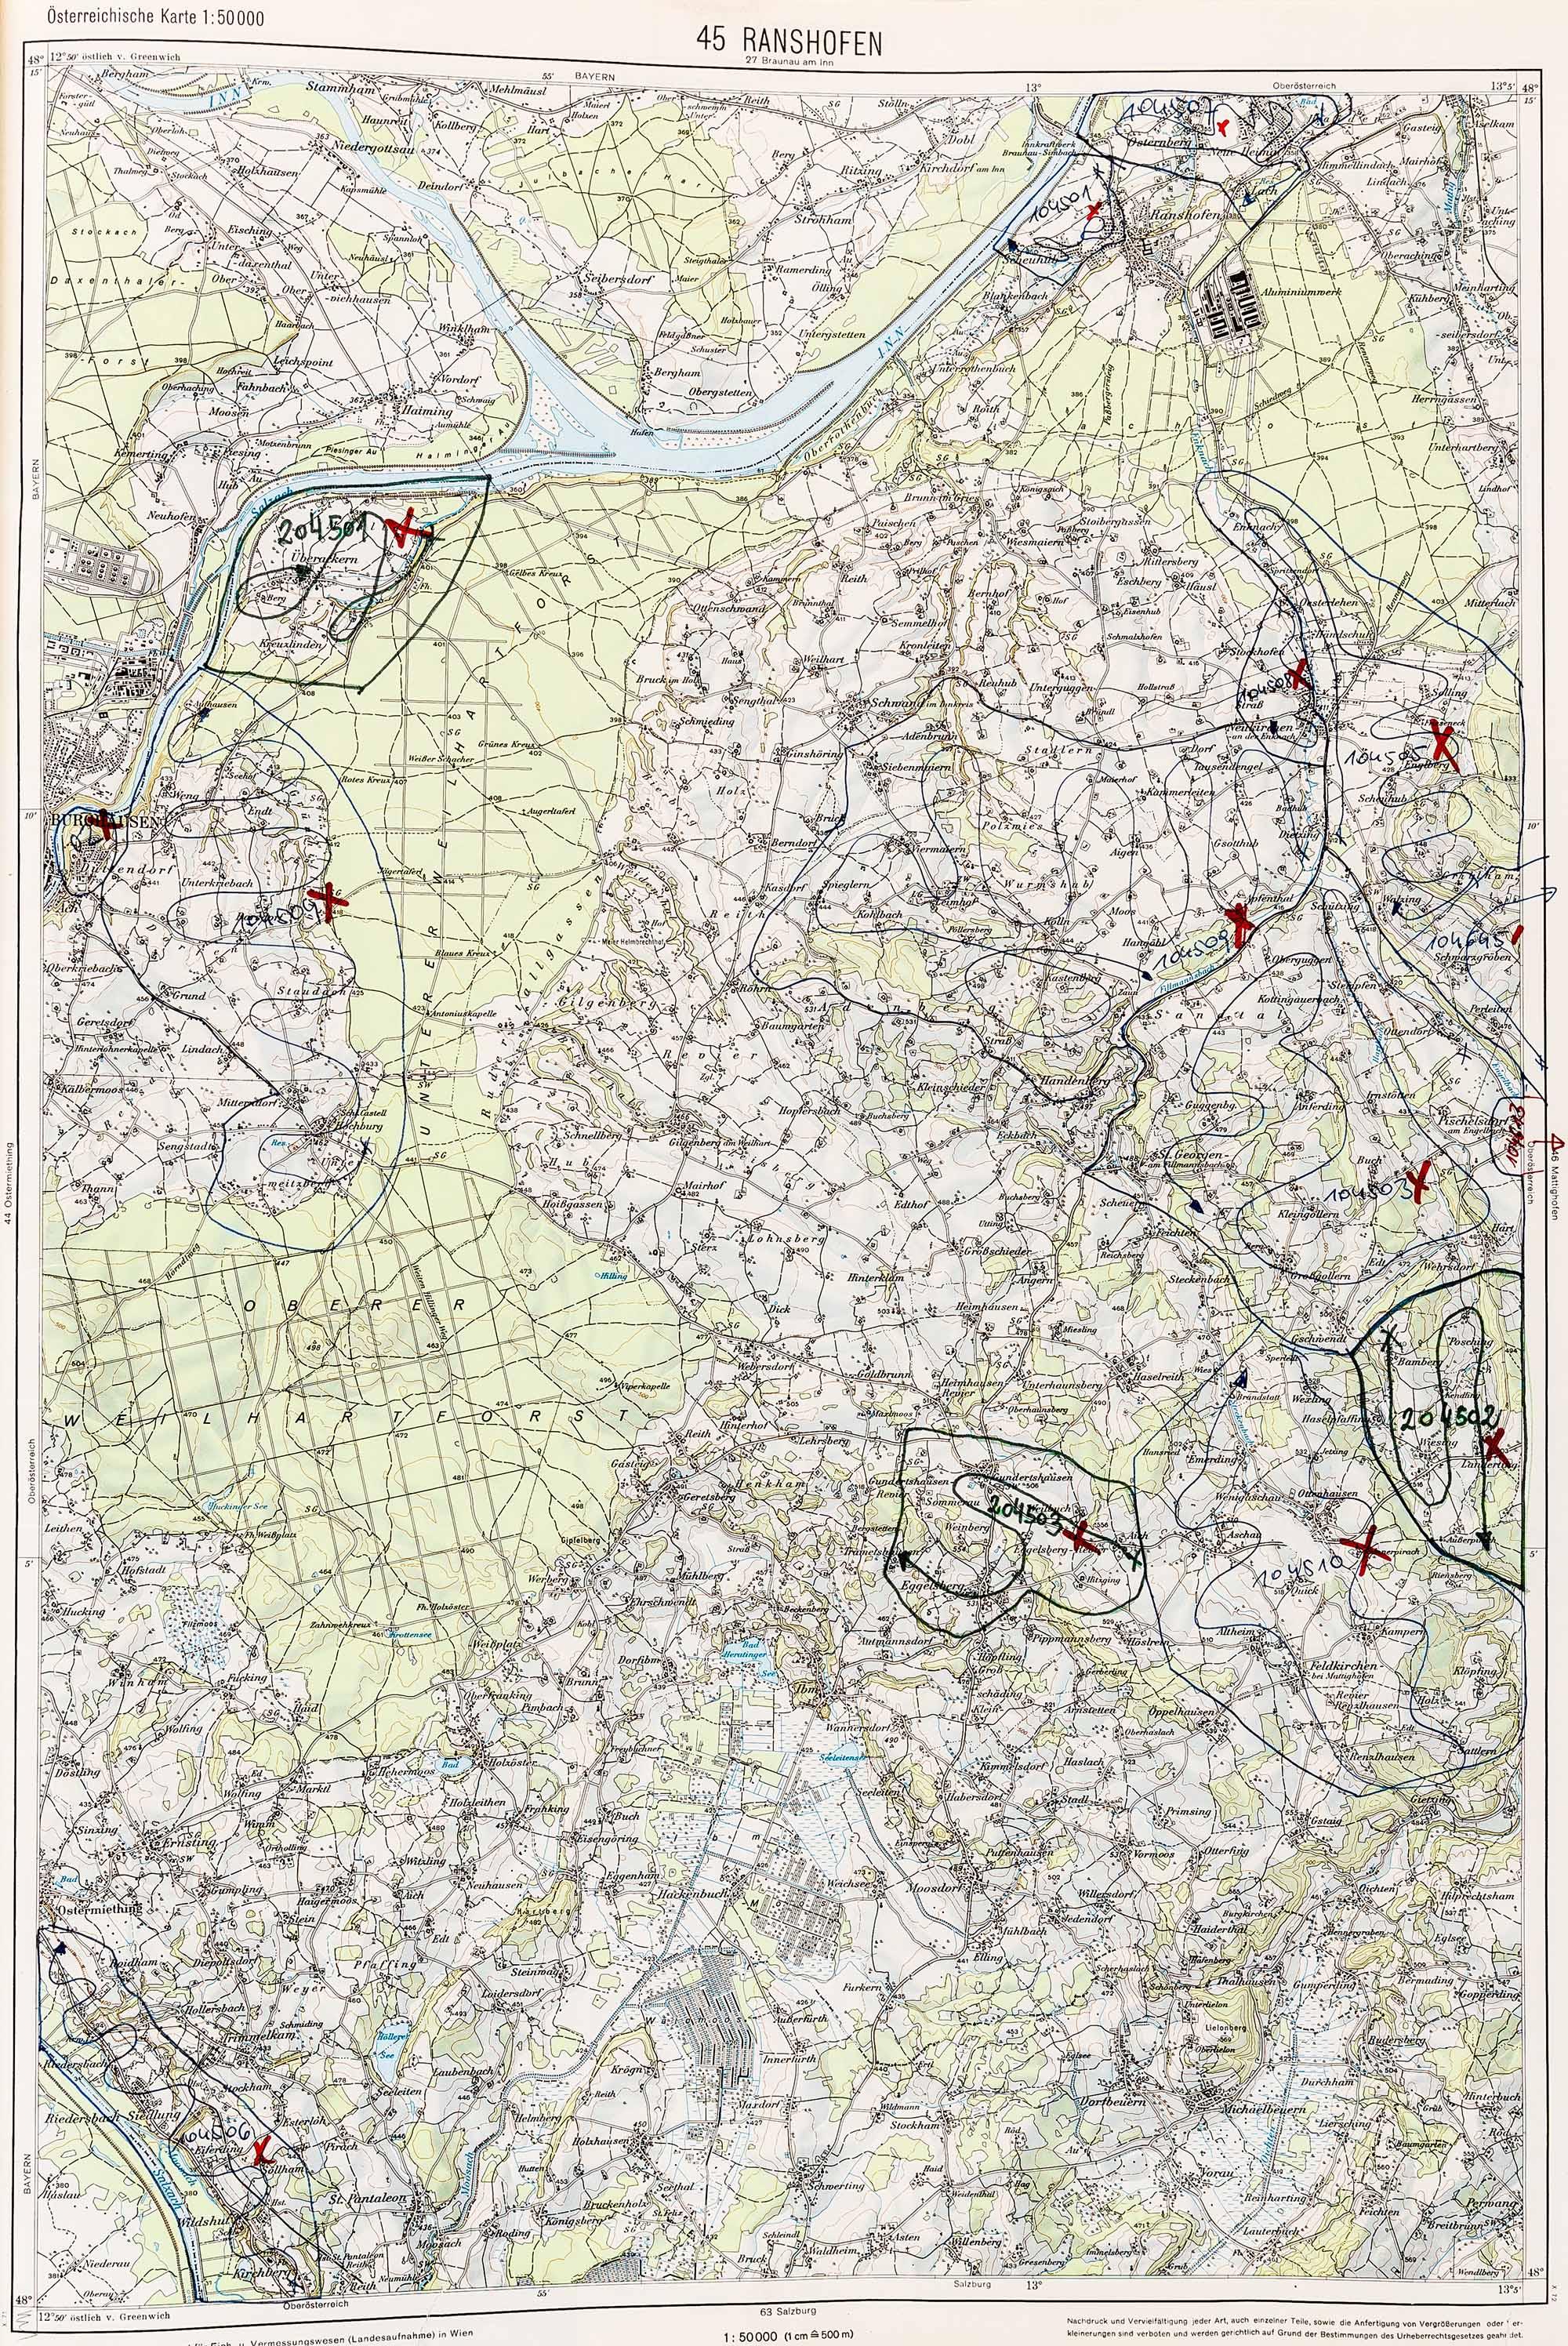 1979-1982 Karte 045